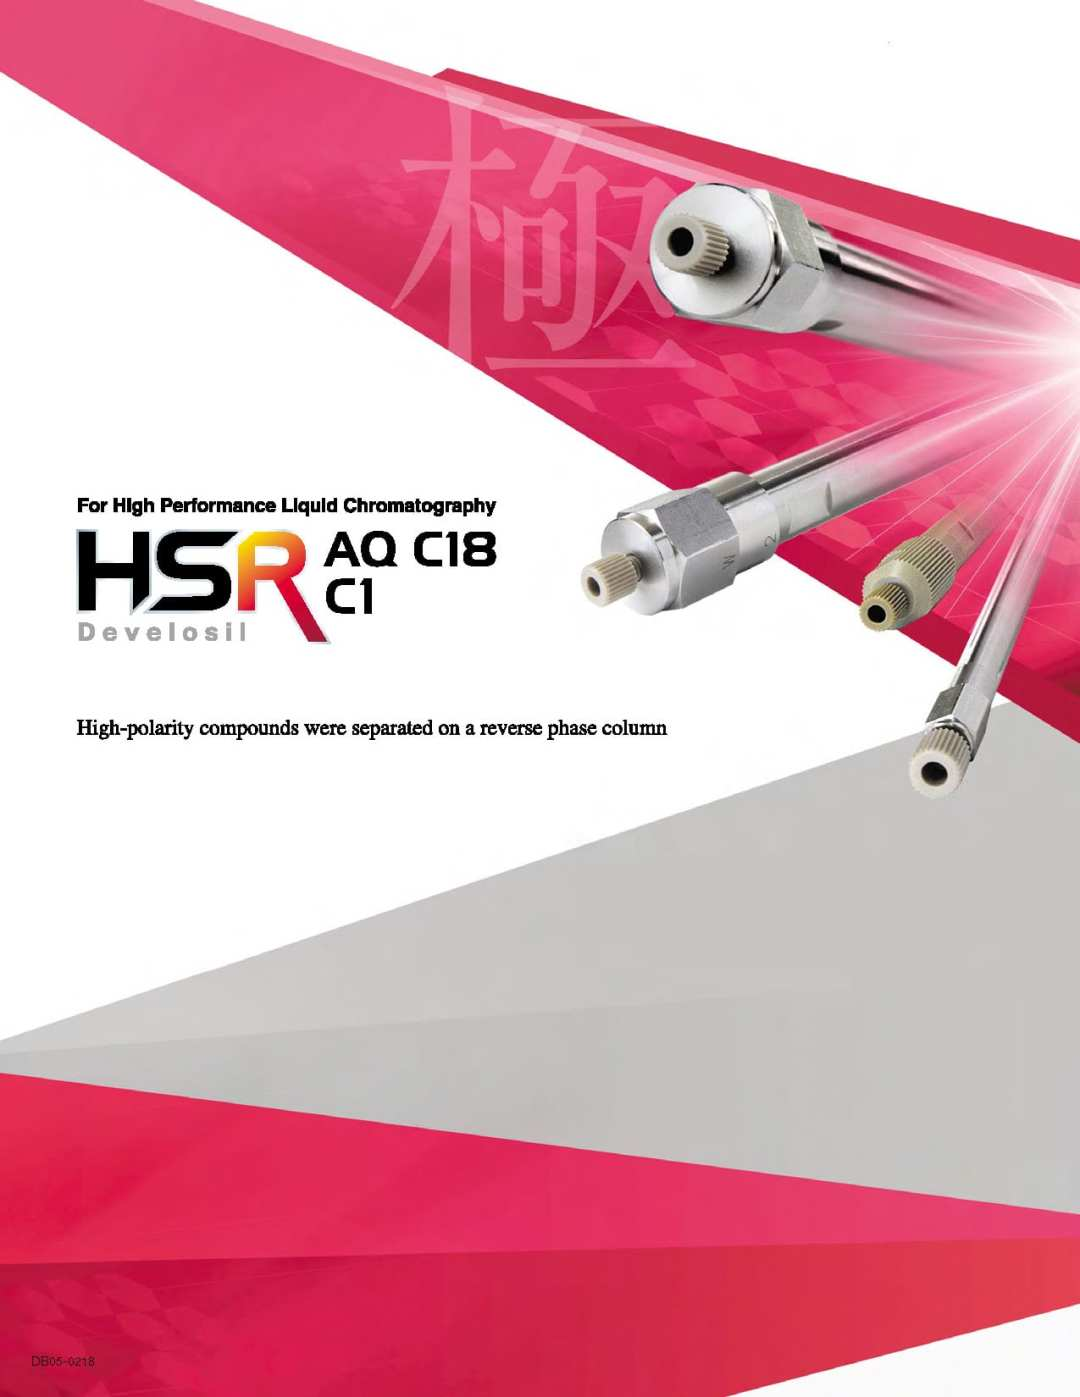 Develosil HSR AQ C18, C1 Product Brochure